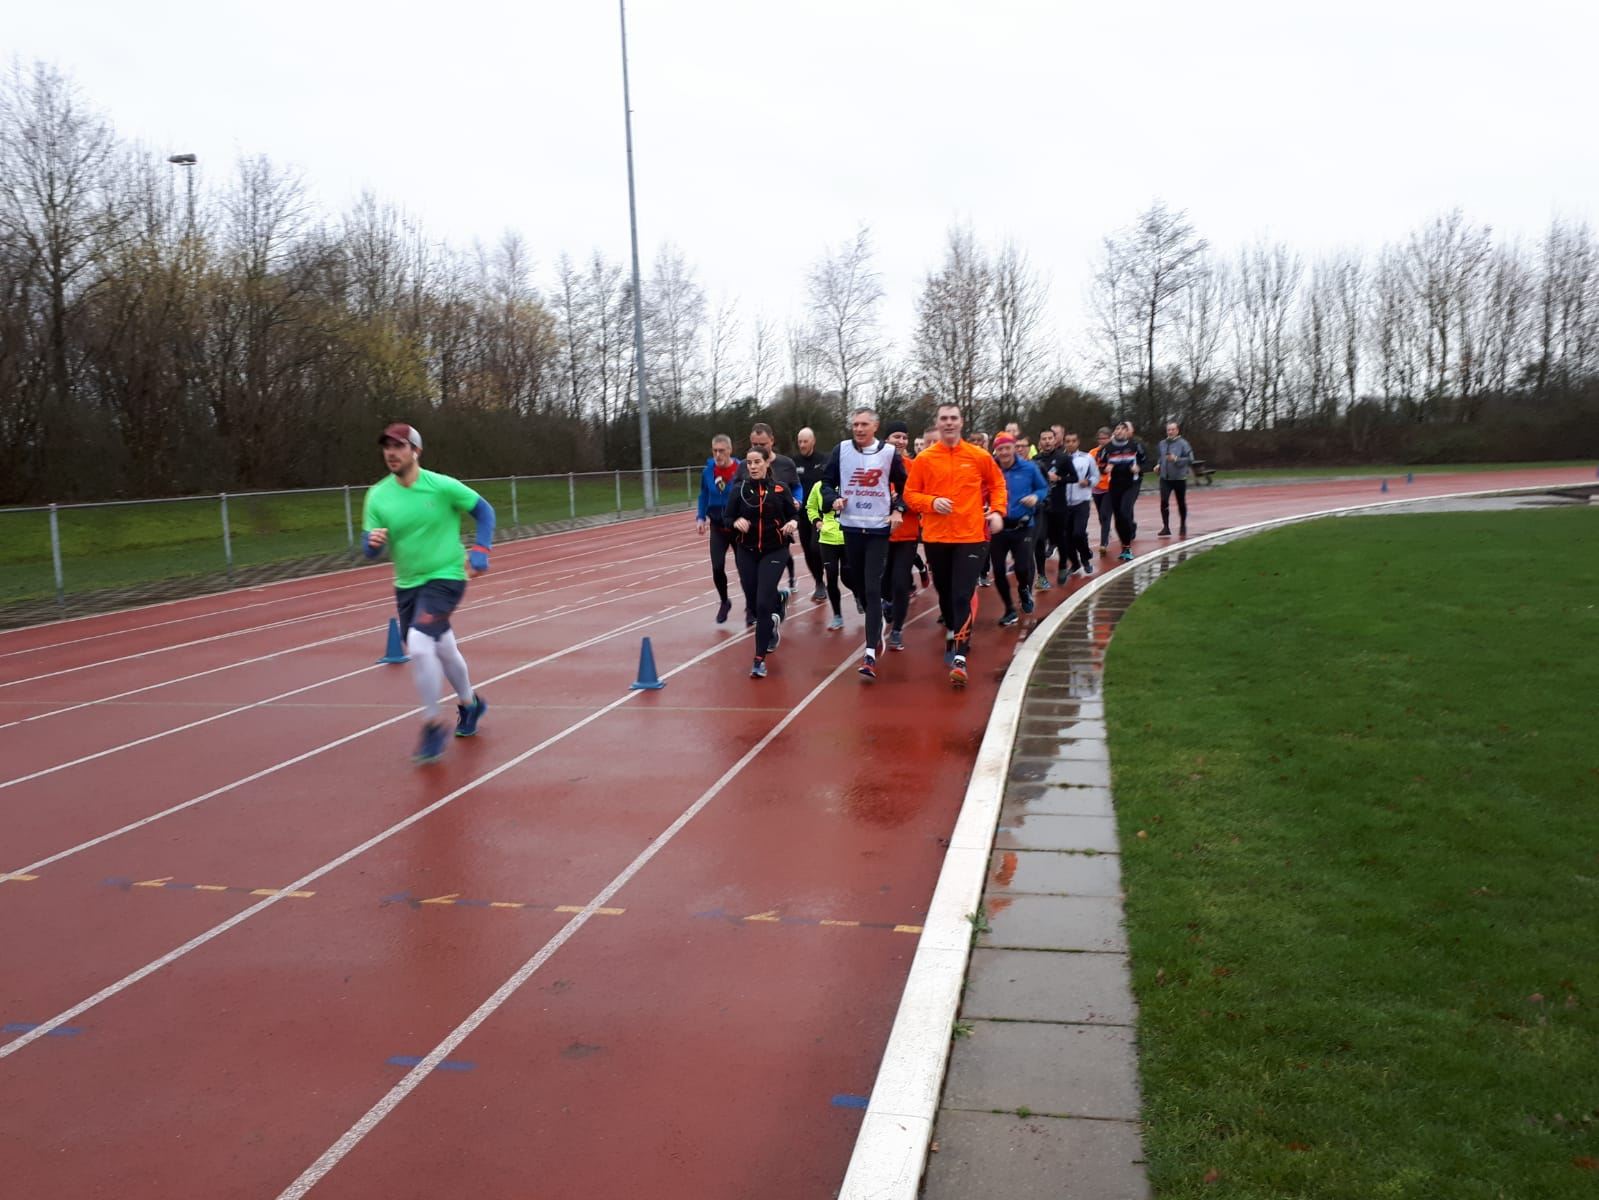 Groepje lopers op atletiekbaan